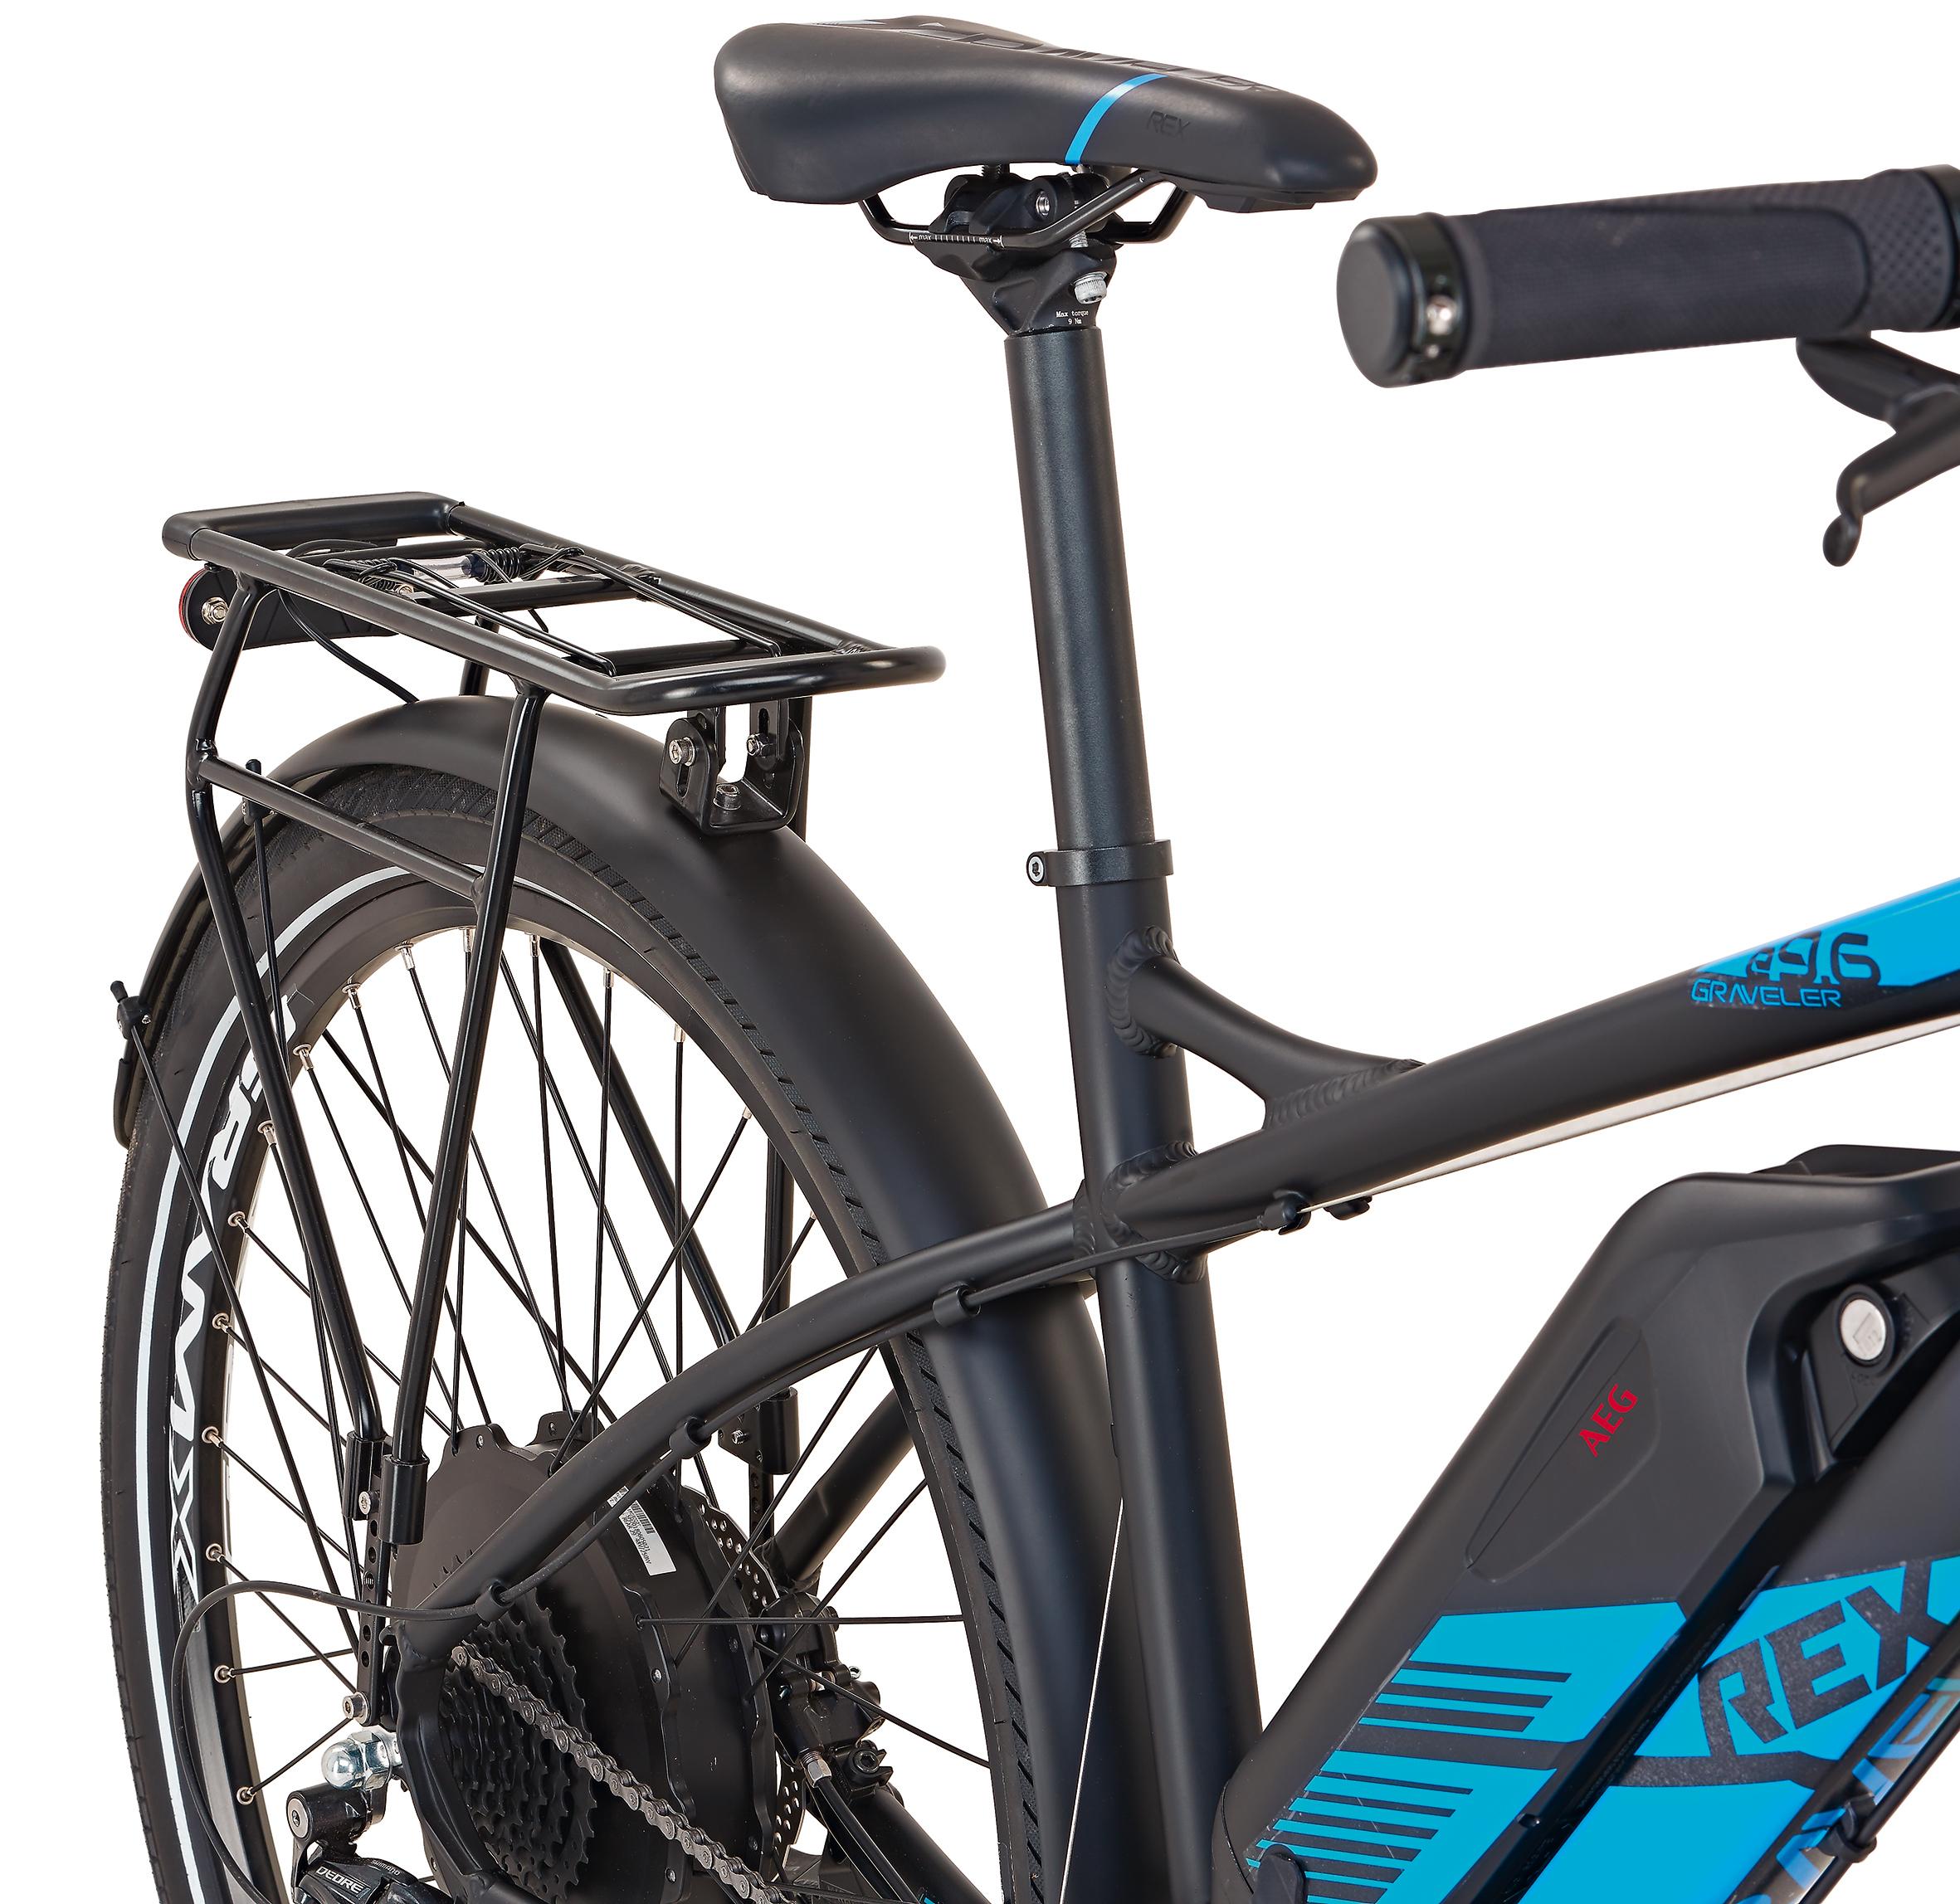 "Rex Bike Elektrofahrrad / E-All Terrain Bike Graveler e9.6 E-ATB 29"" Bild 5"